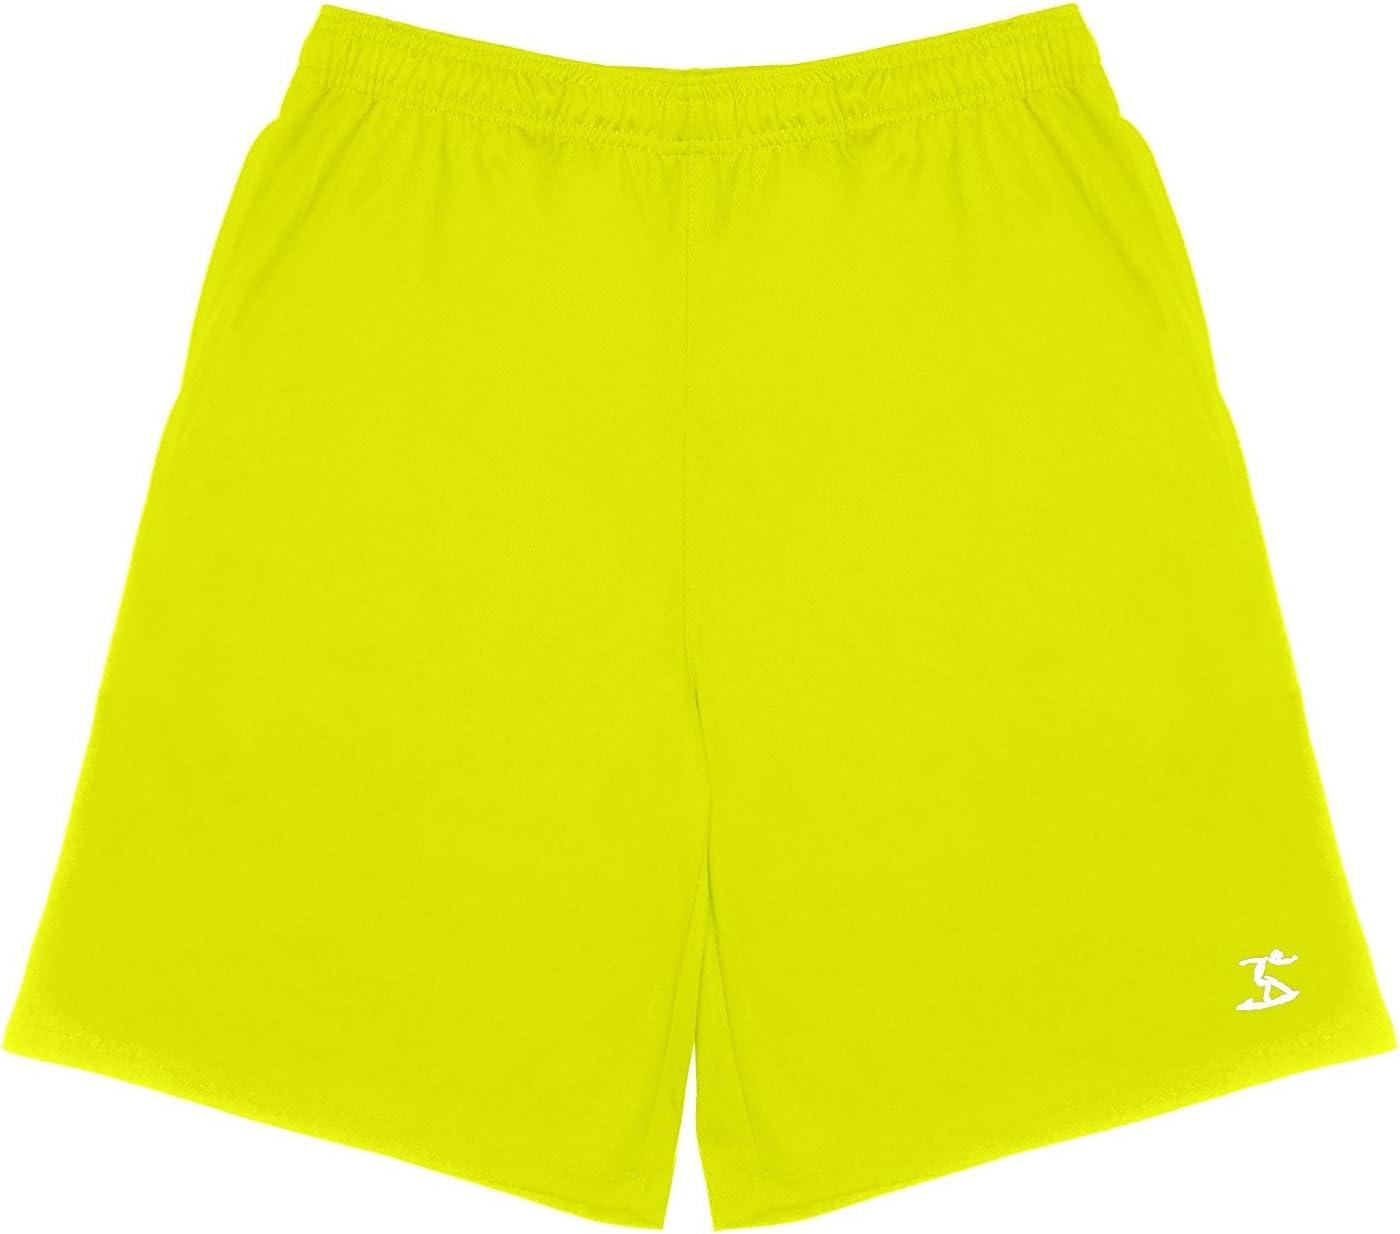 UZZI Austin Mall Men's Athletic Workout Dri Shorts Special price UPF 50+ Fit